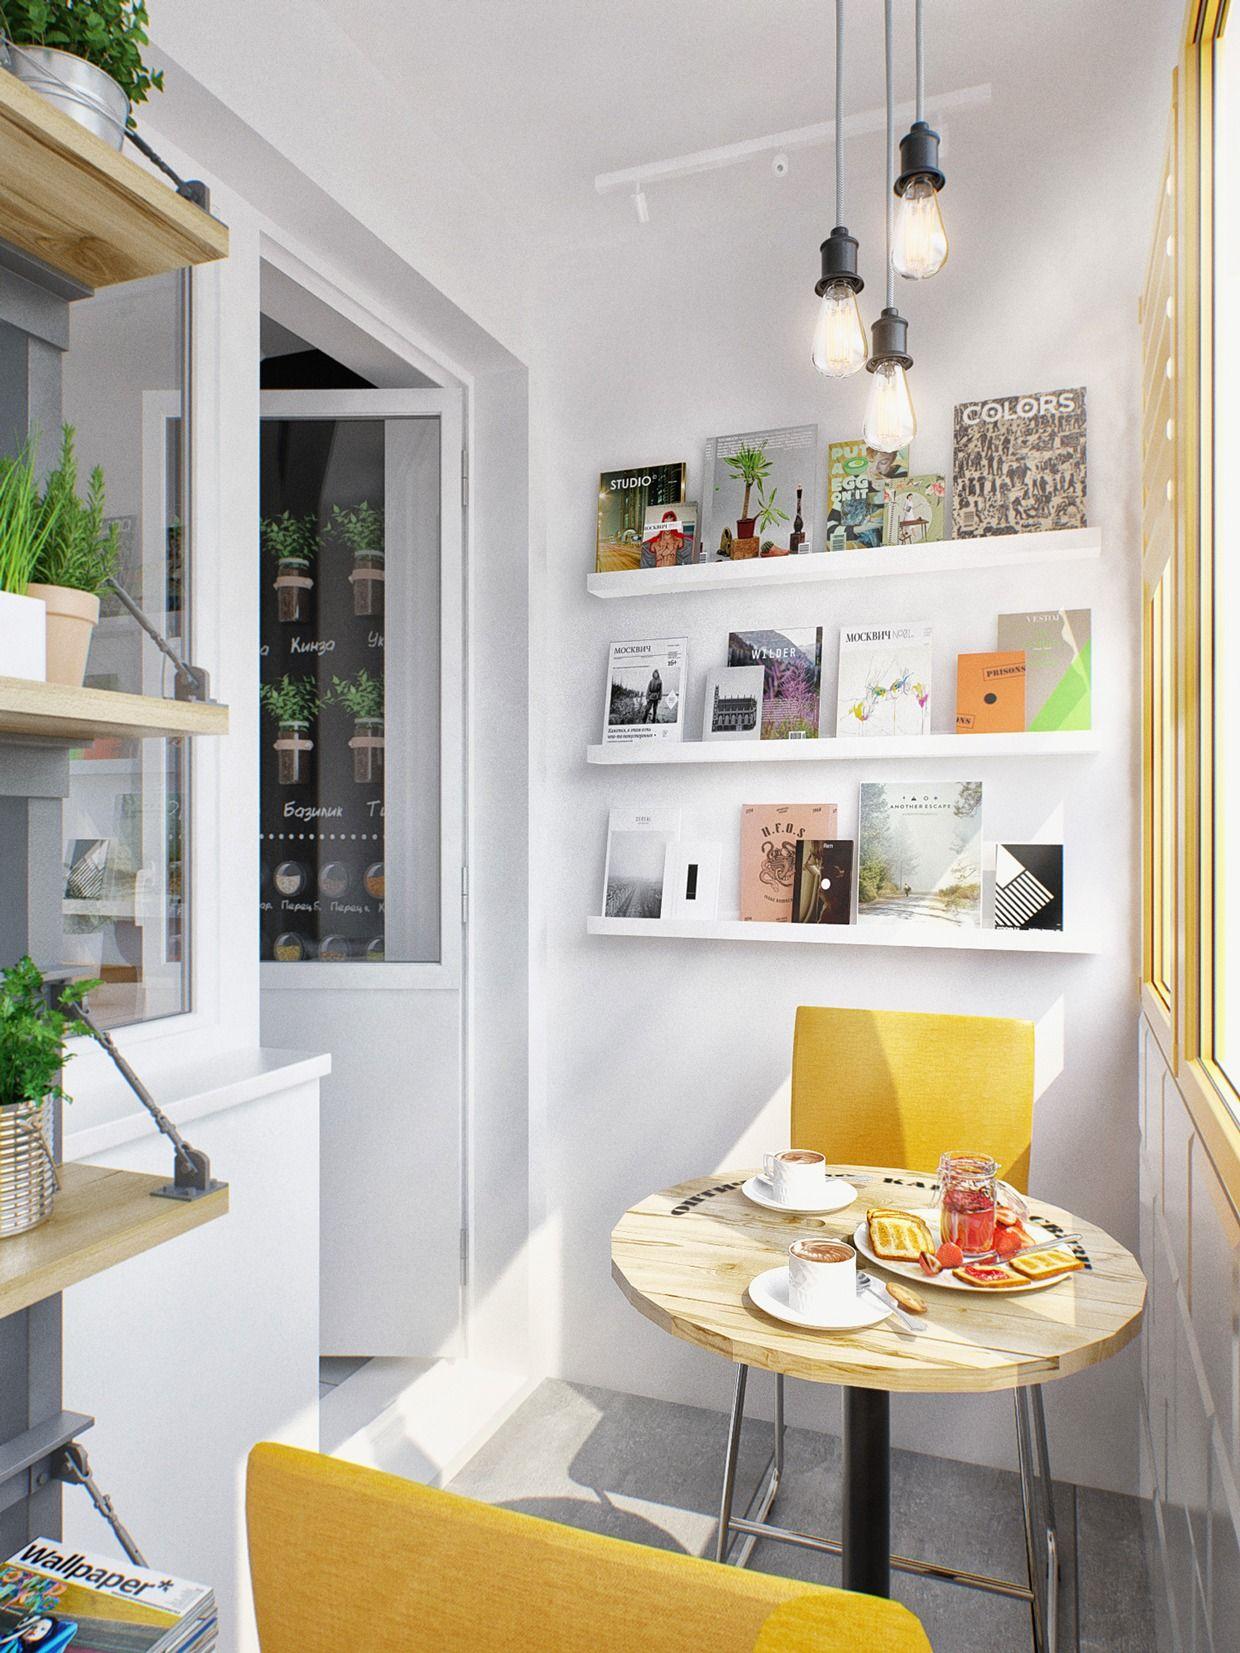 2 Simple Super Beautiful Studio Apartment Concepts